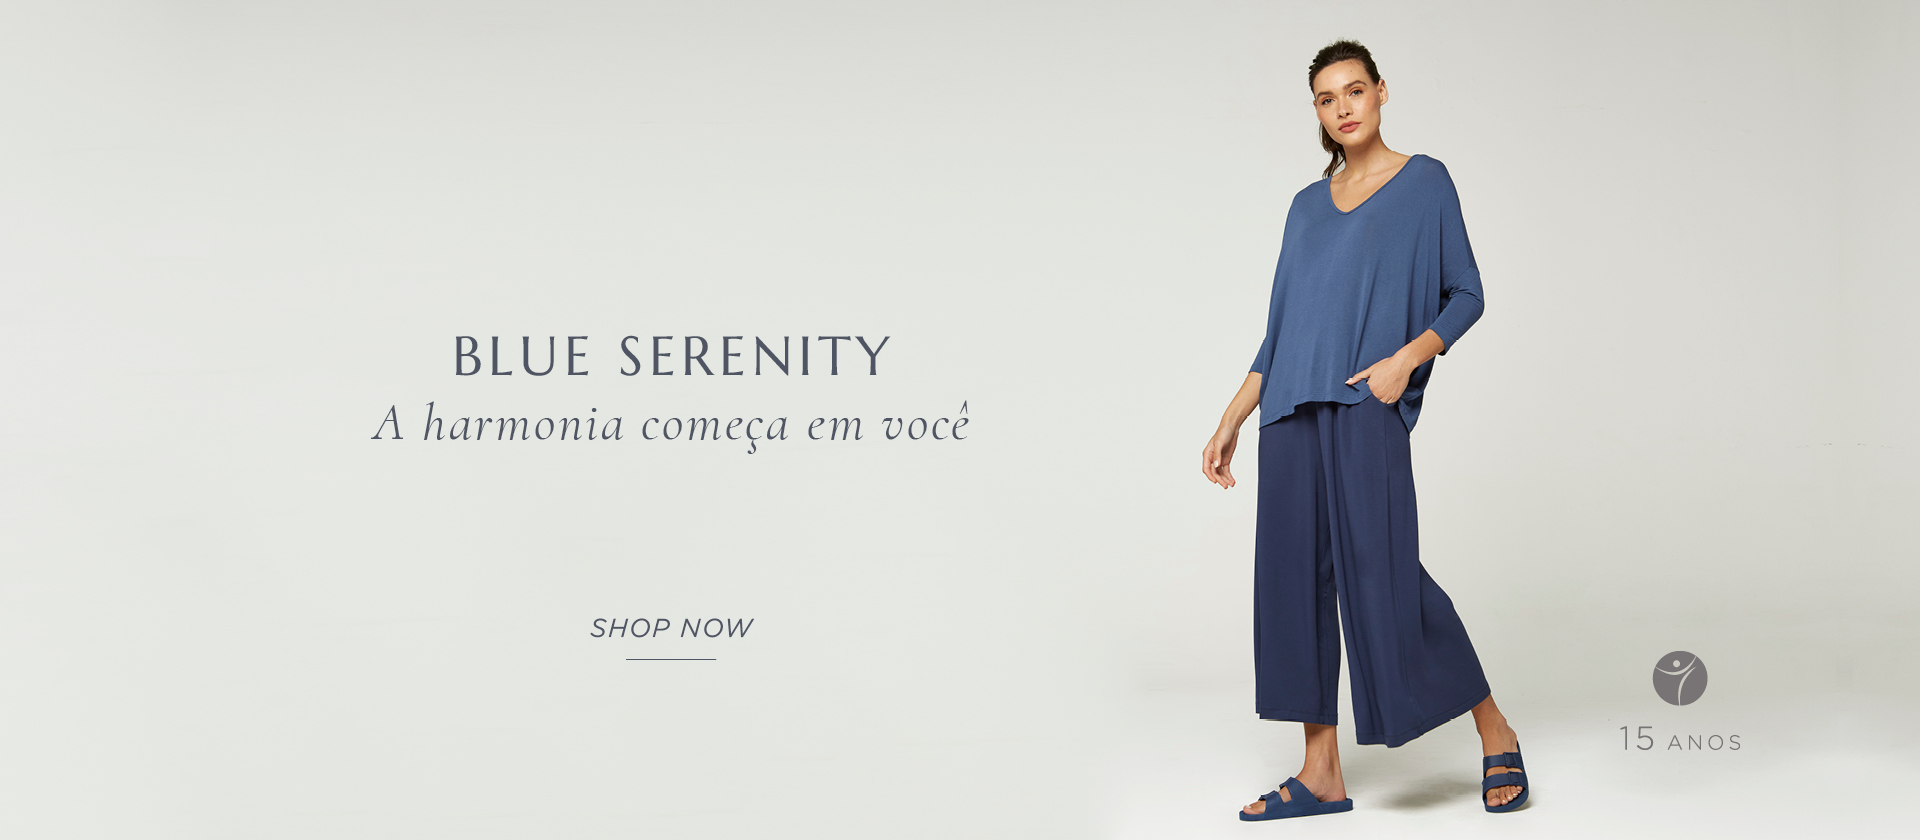 Desktop - 18/11 - Blue Serenity